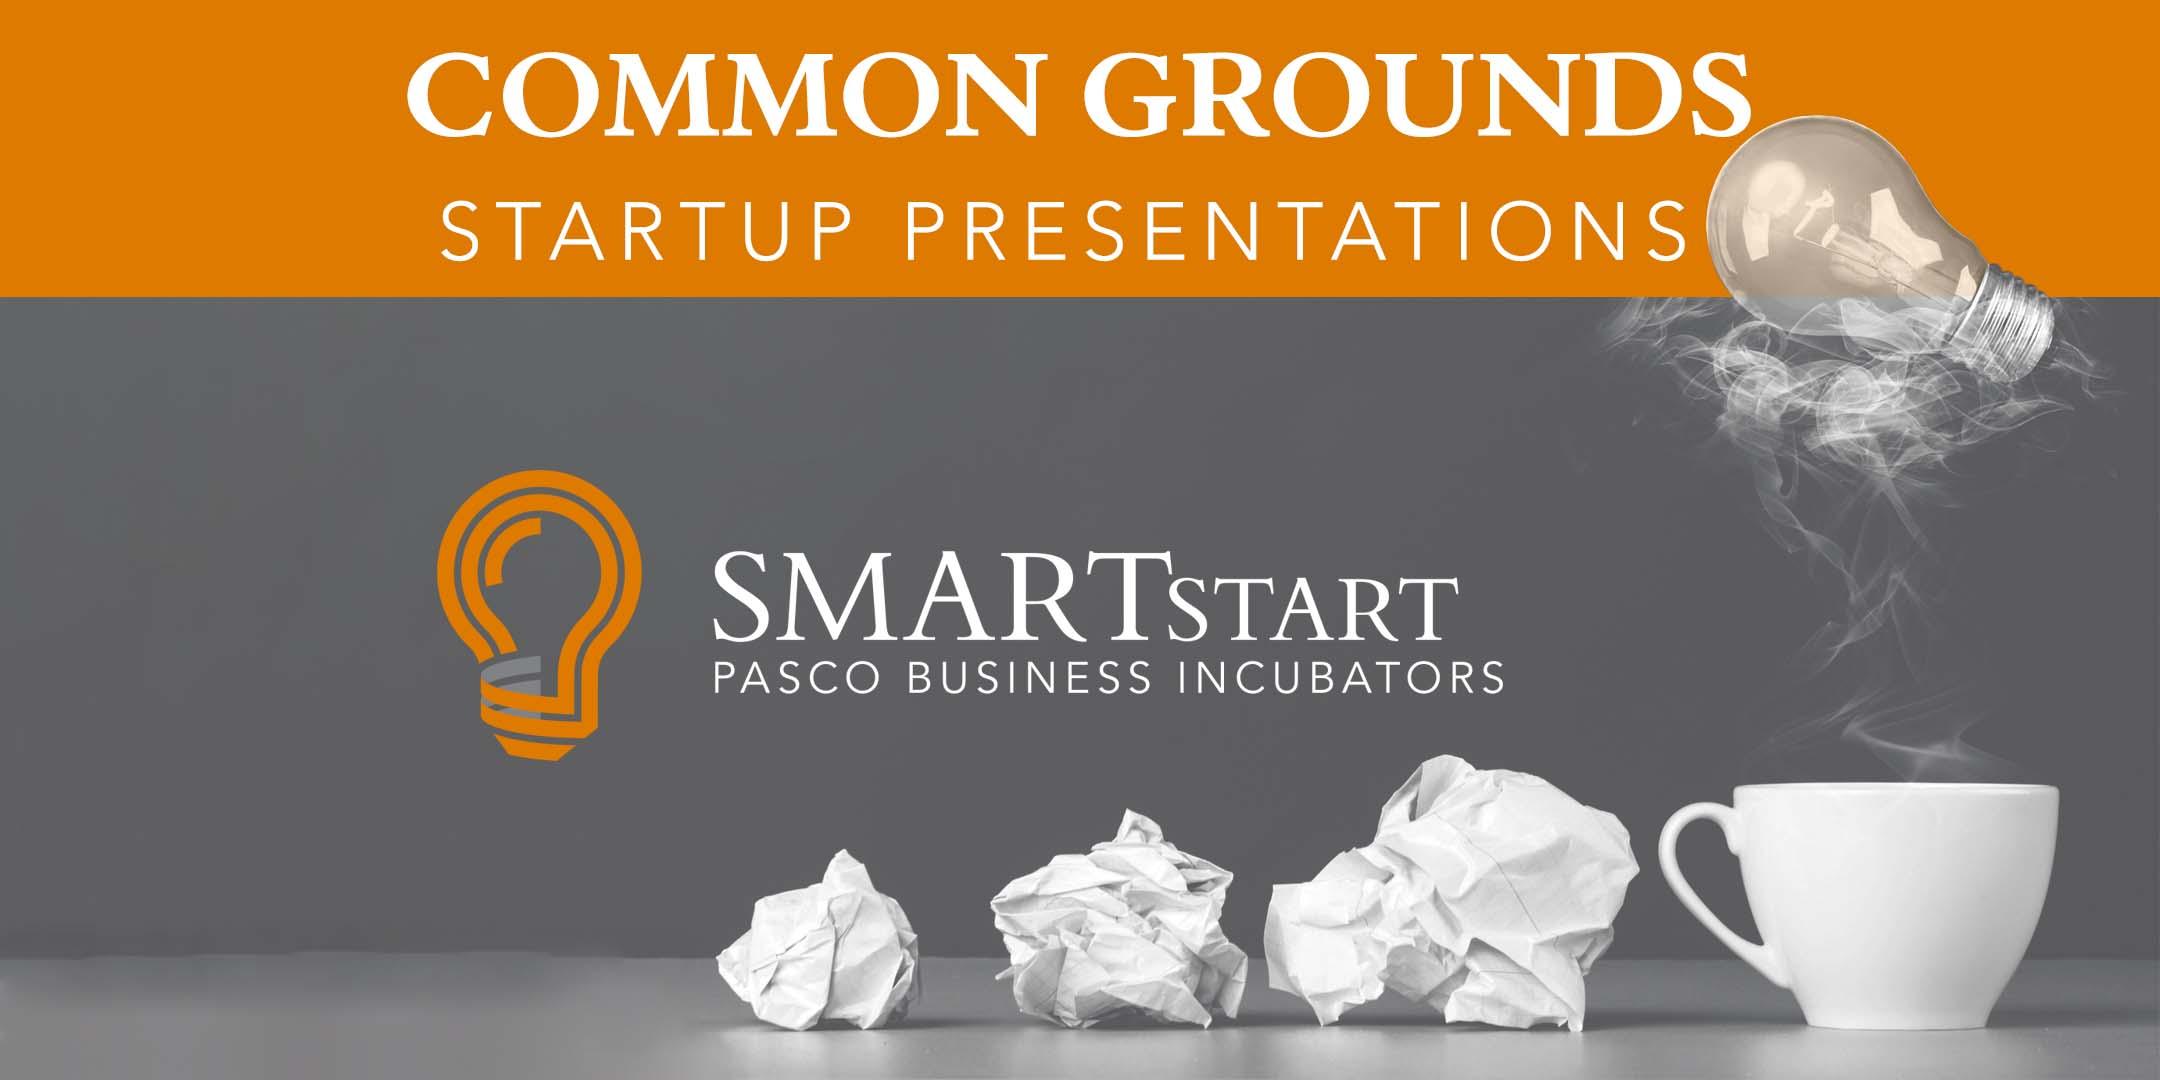 Common Grounds Startup Presentations, SMARTstart Pasco Business Incubators